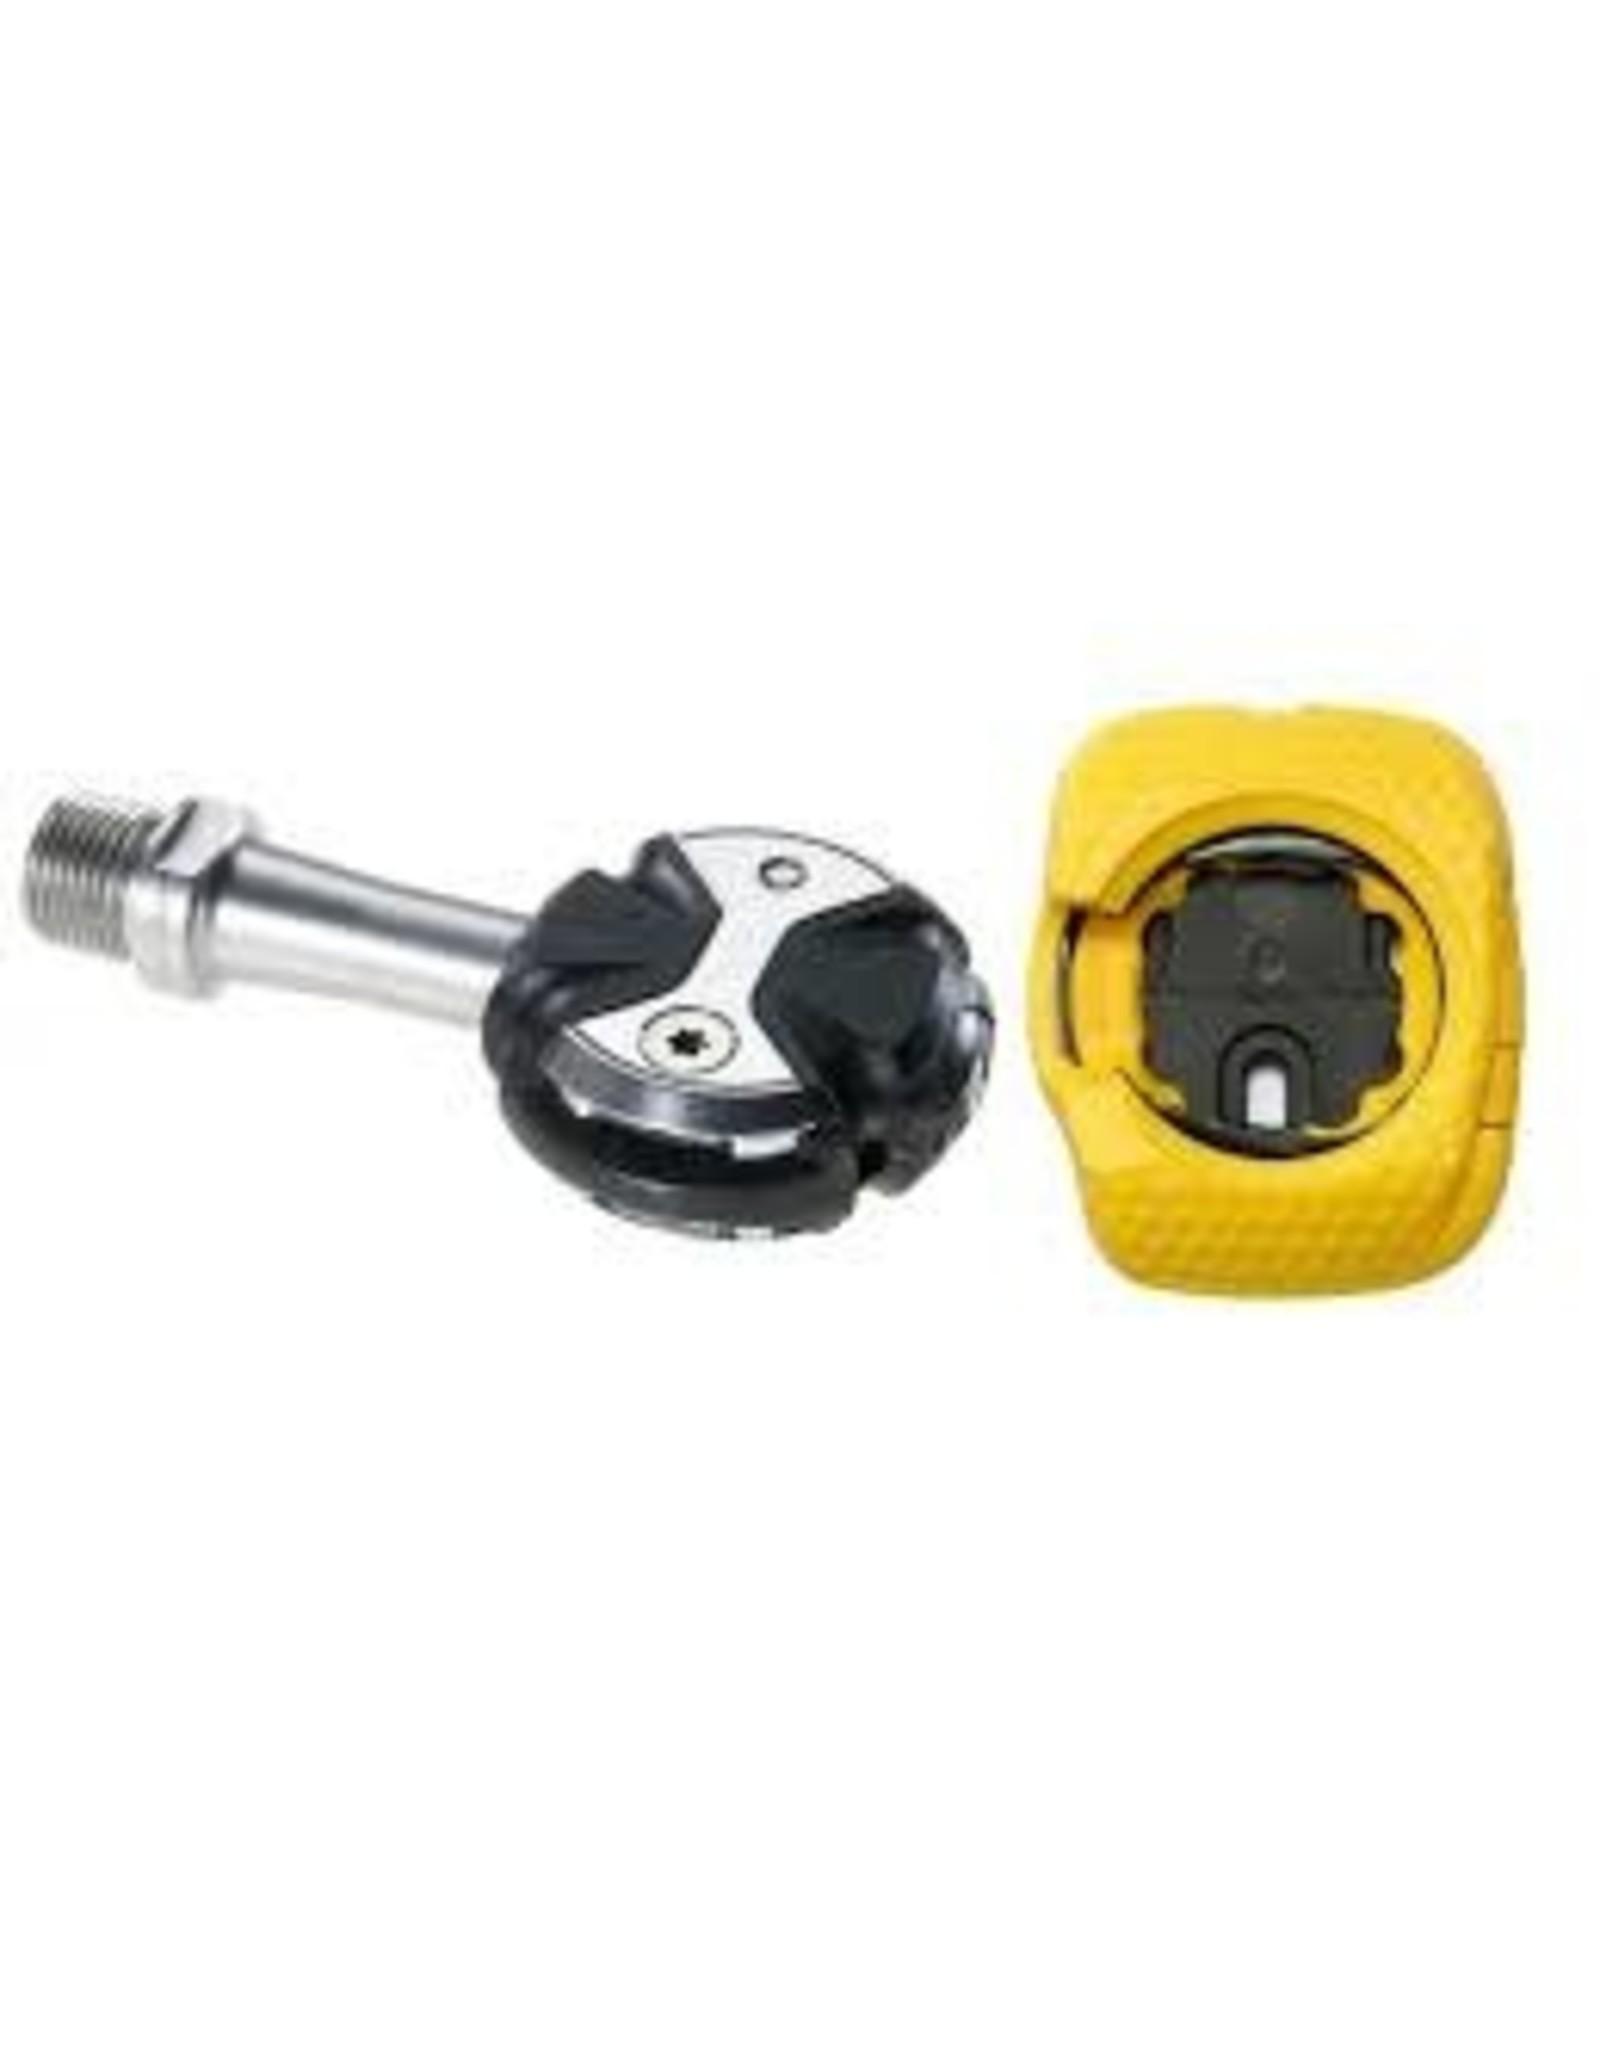 Speedplay, Inc. Pedal Speedplay Zero Cleat Walkable